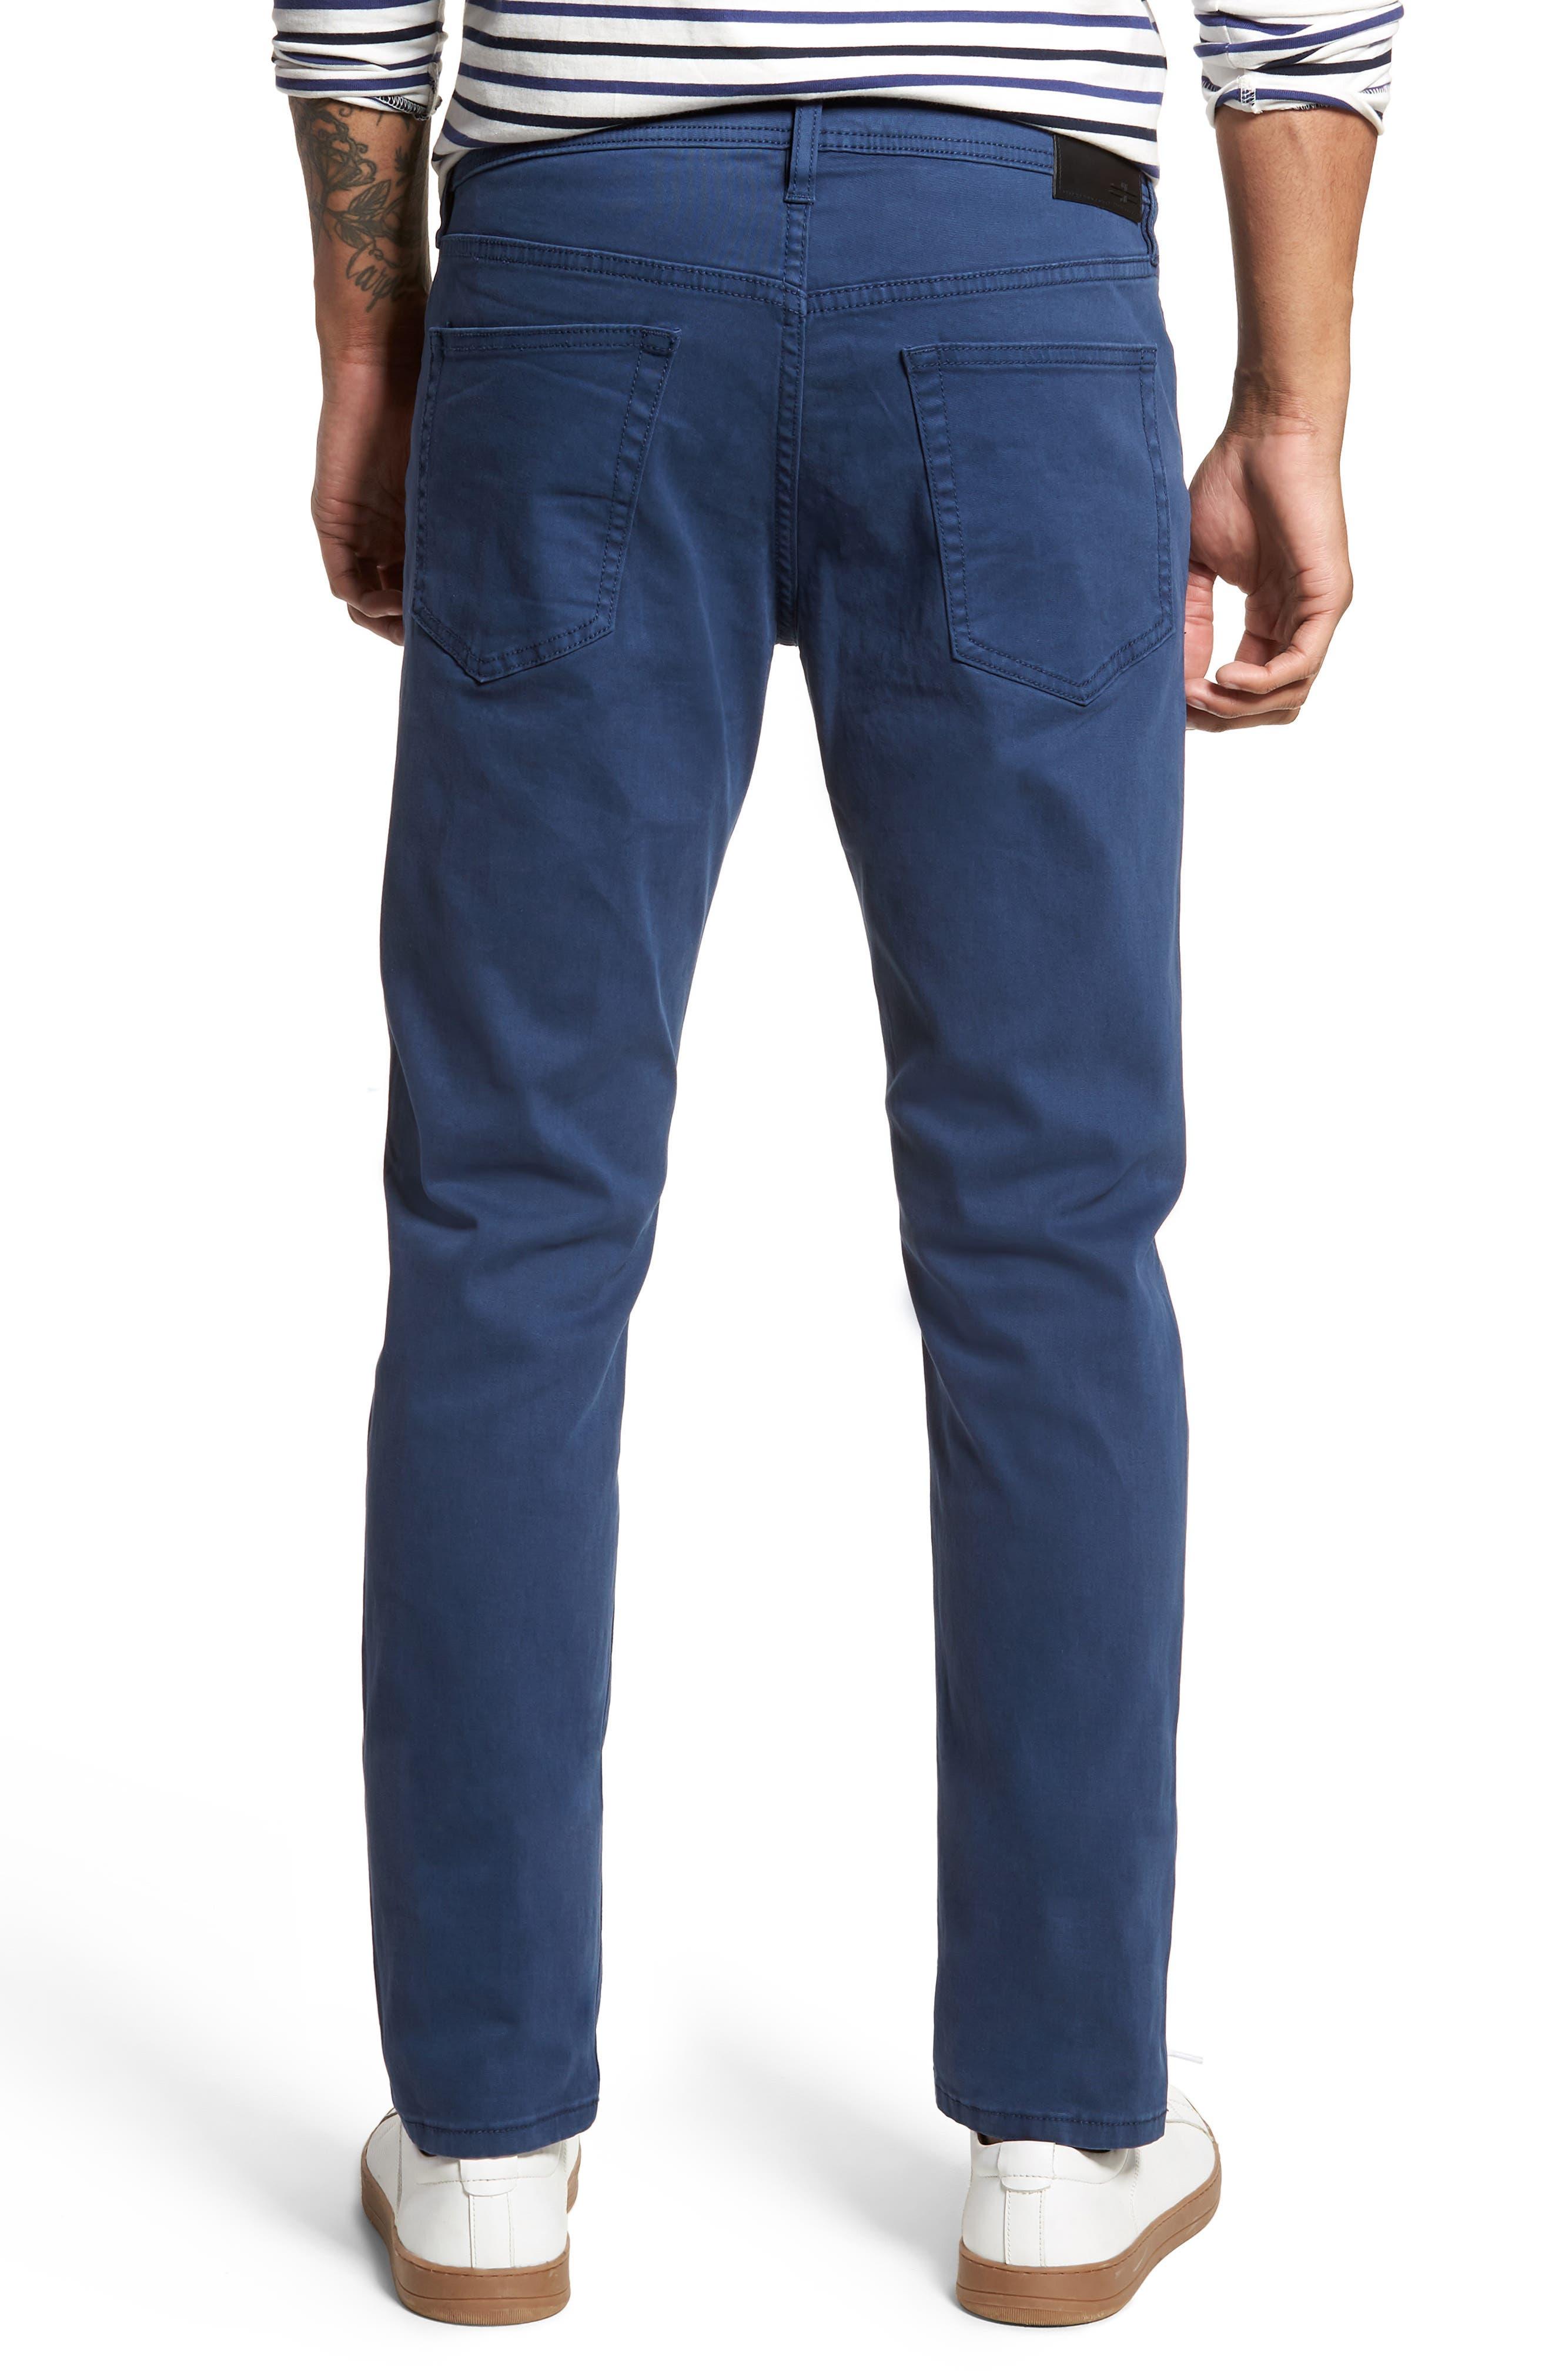 Alternate Image 2  - Liverpool Jeans Co. Kingston Slim Straight Leg Jeans (Blue Twilight)